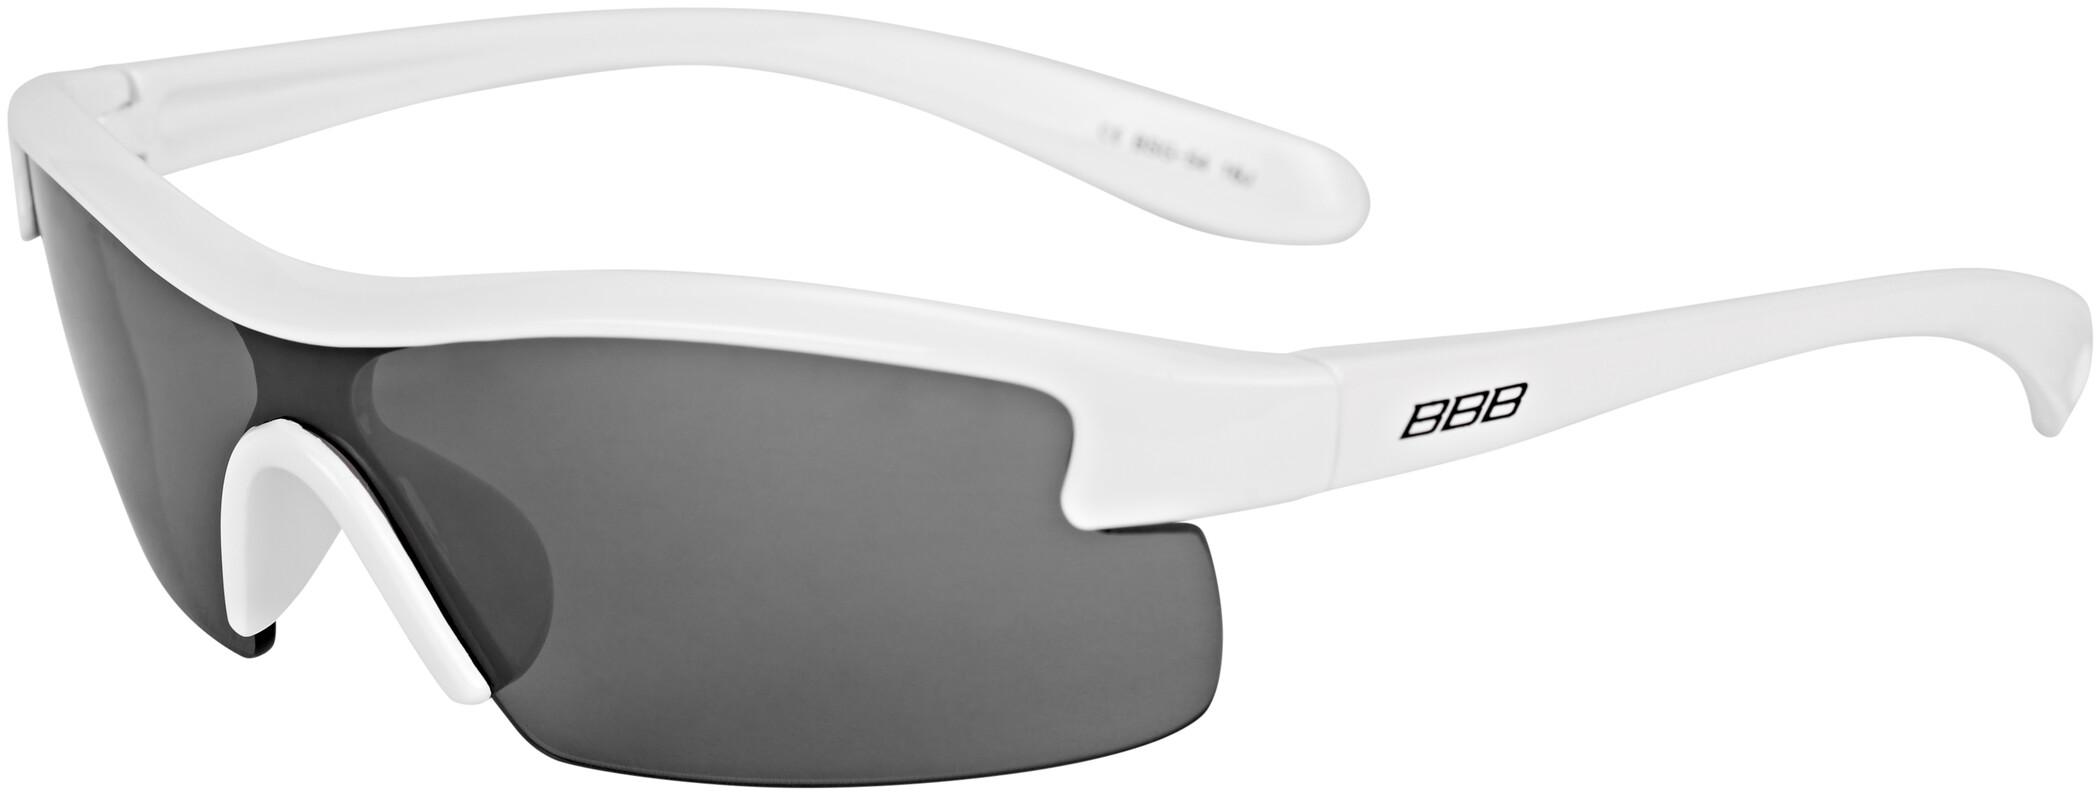 BBB BSG-54 - Kids Cycling Glasses | Glasses